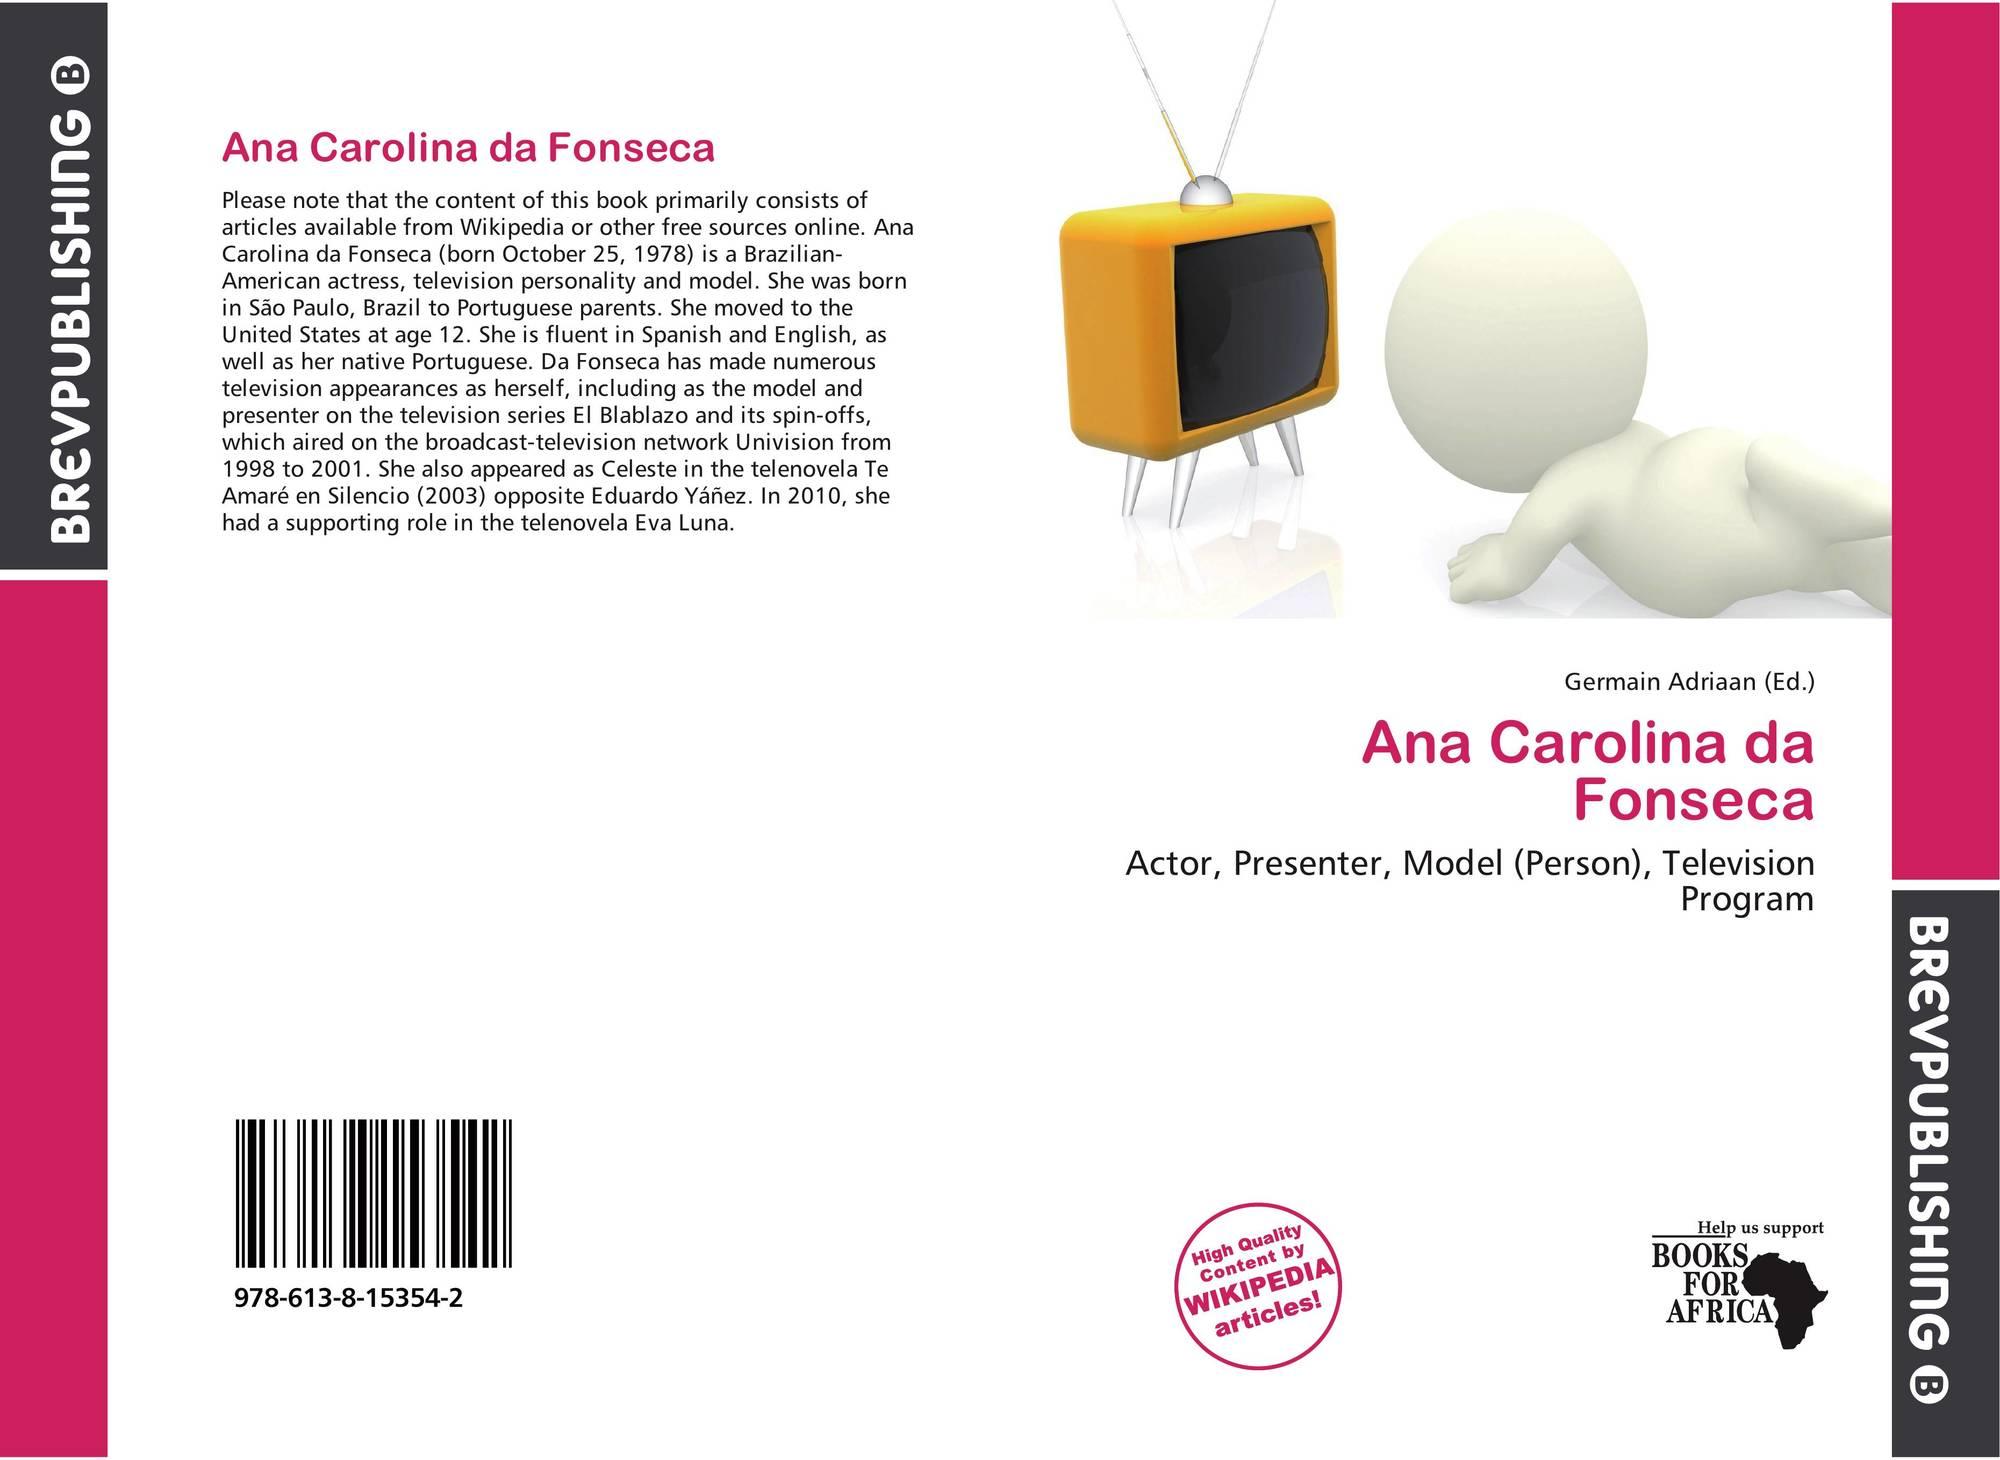 Caitlin Clarke,Cathy Freeman 2 Olympic medals in running Porno images Ann Davies (born 1934),Carmencita Abad (b. 1933)